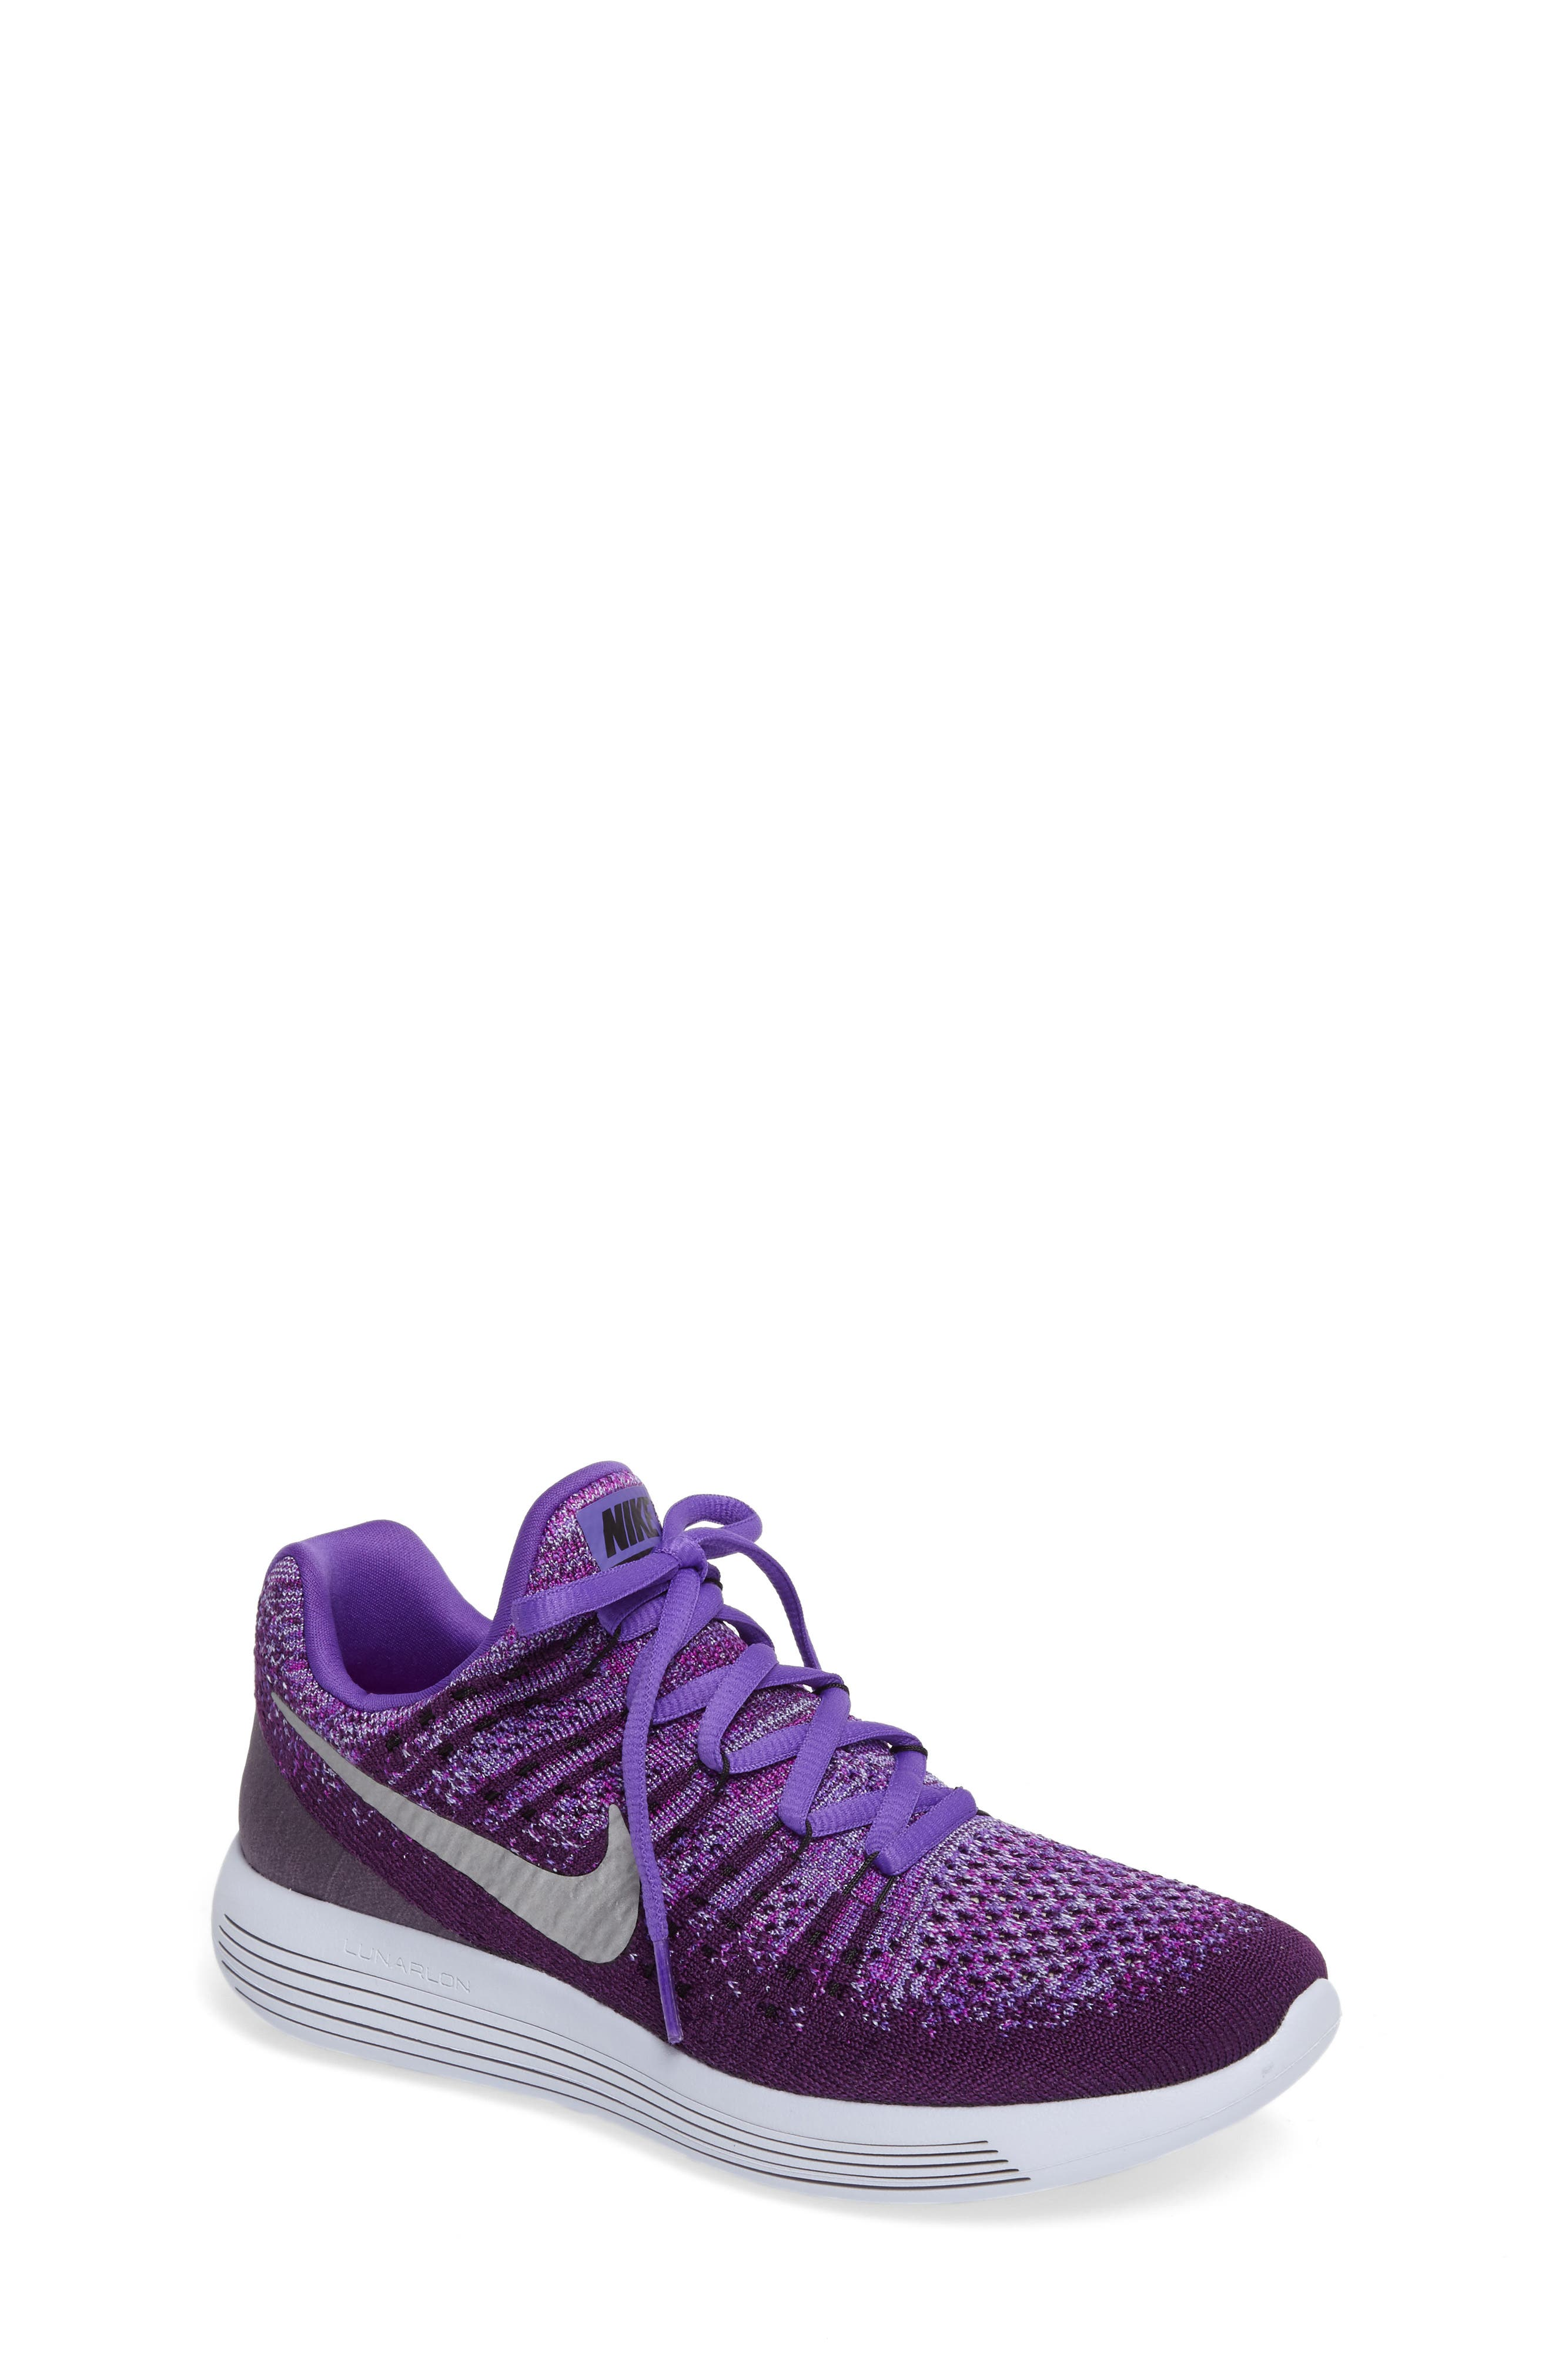 Nike Flyknit LunarEpic Sneaker (Big Kid)